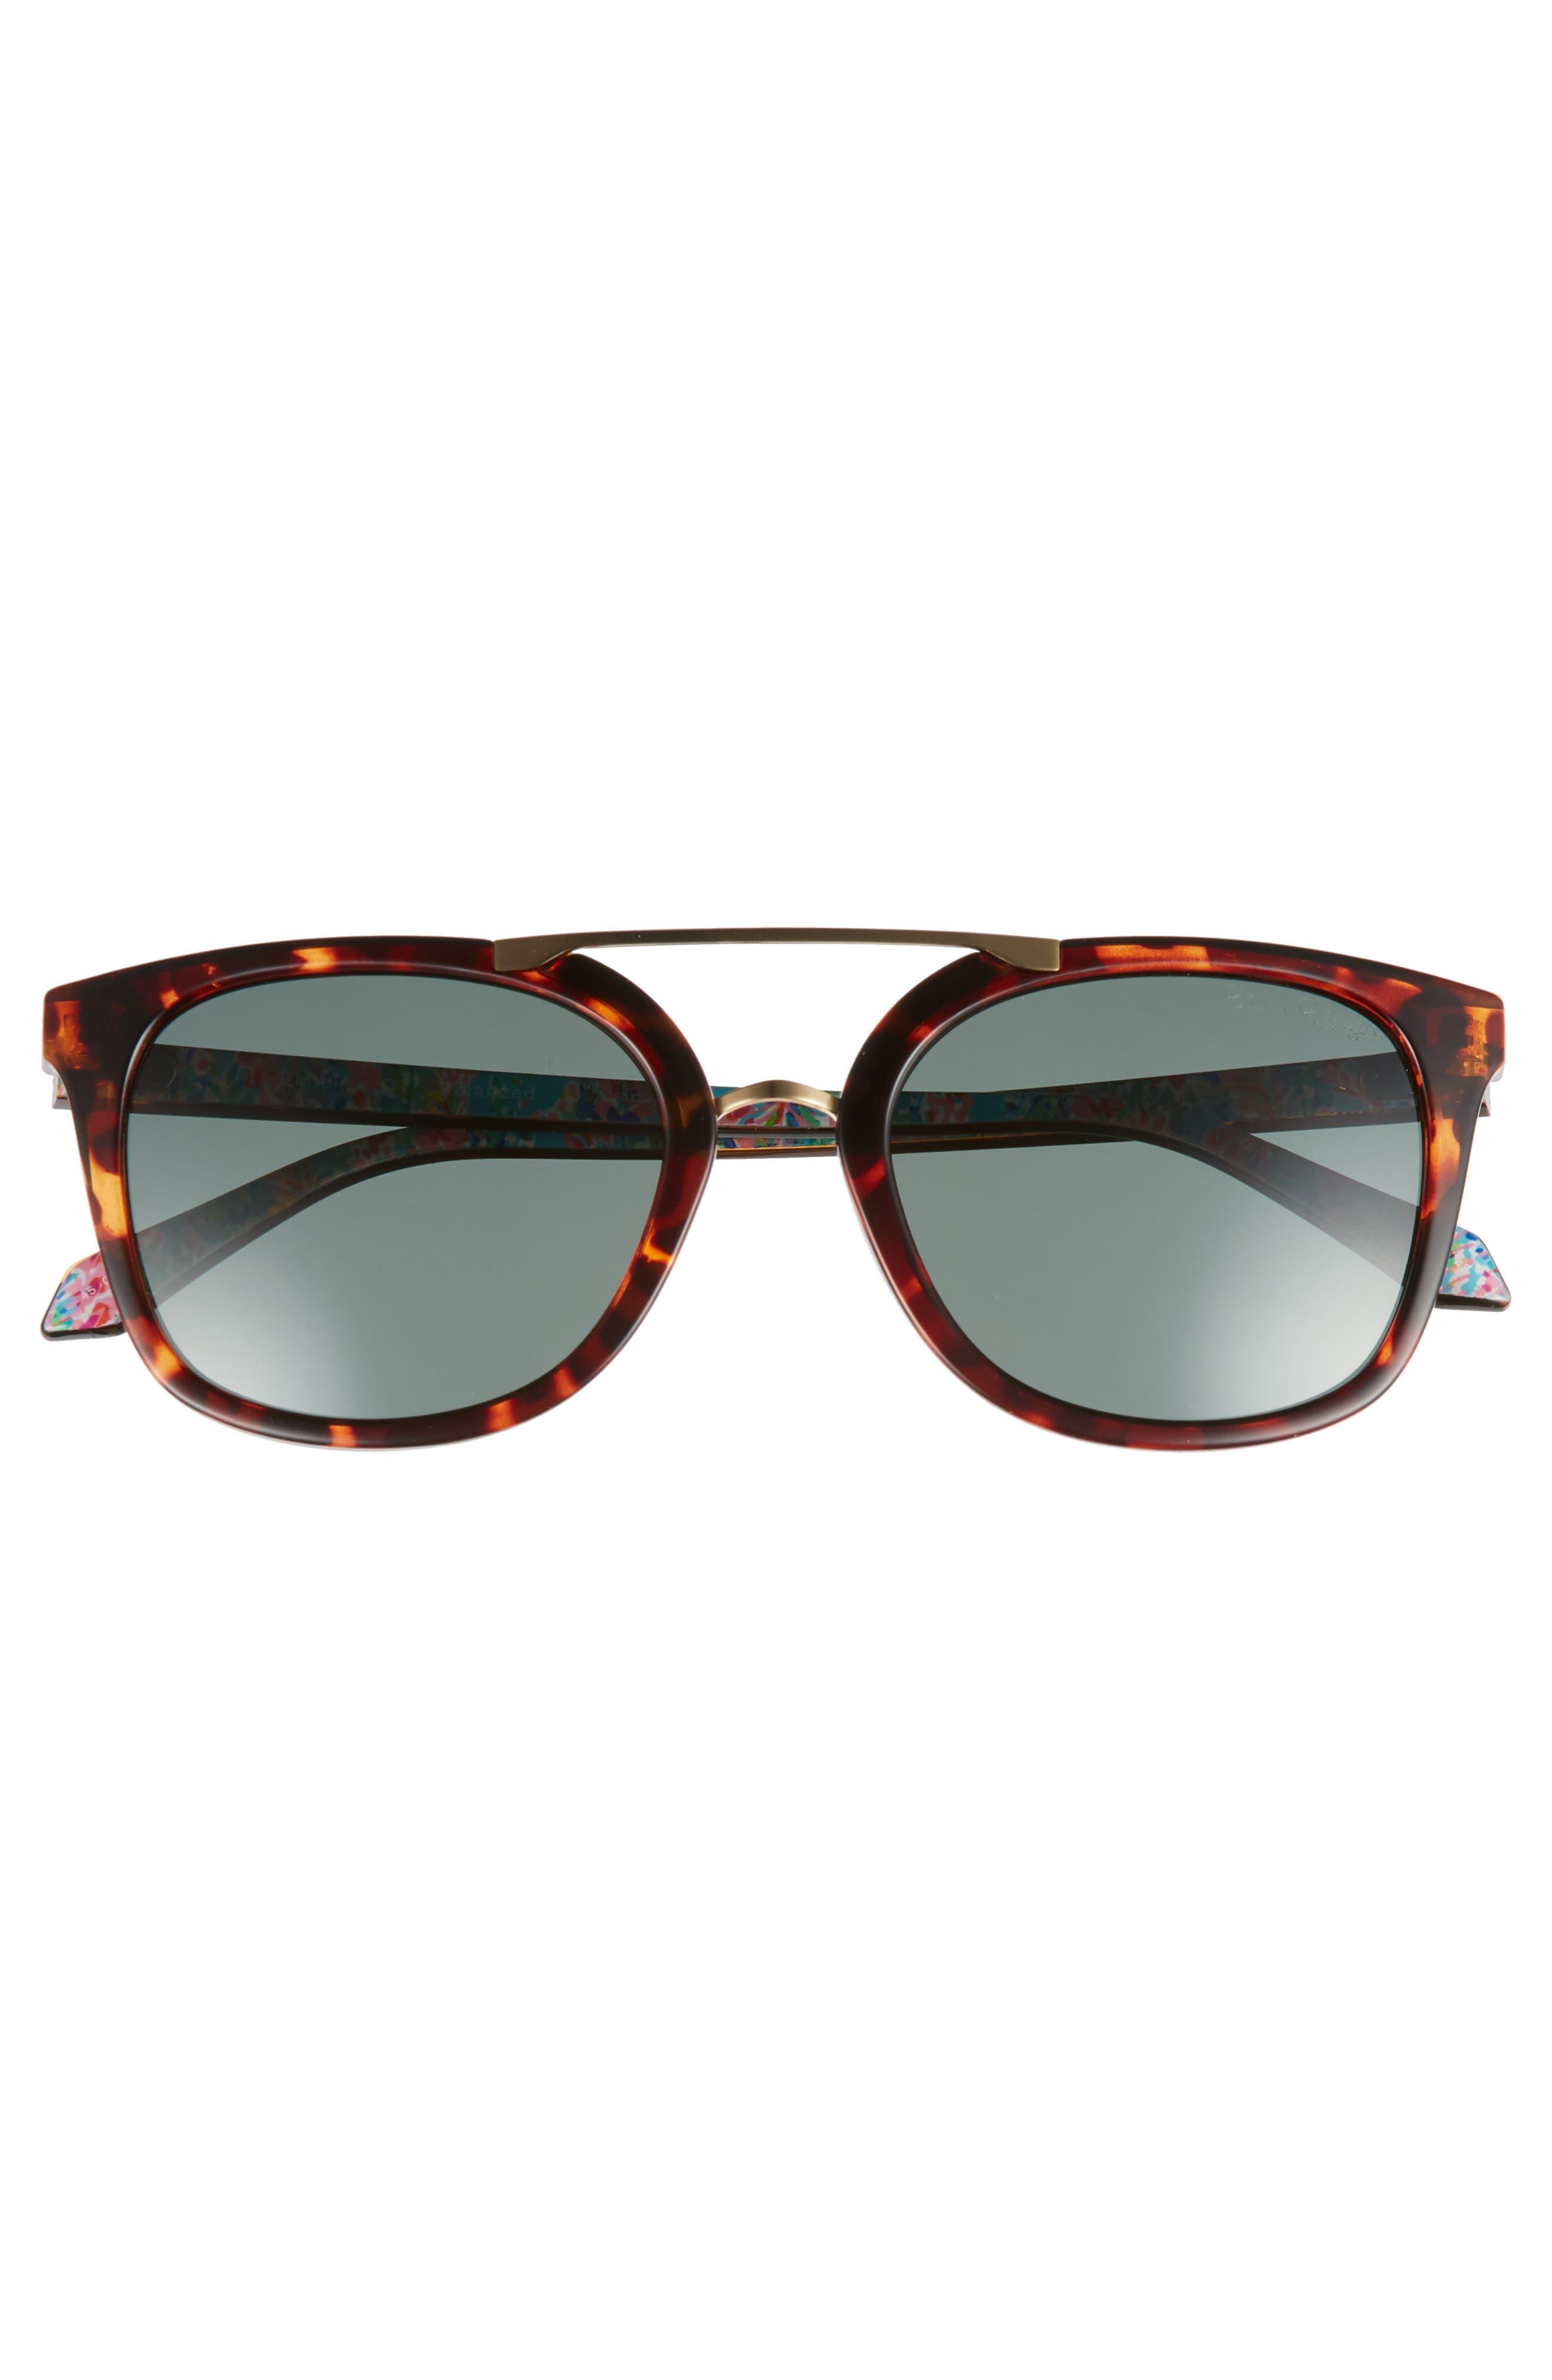 Lilly Pulitzer Emilia 53mm Polarized Sunglasses,                             Alternate thumbnail 3, color,                             DARK TORTOISE/ GREEN